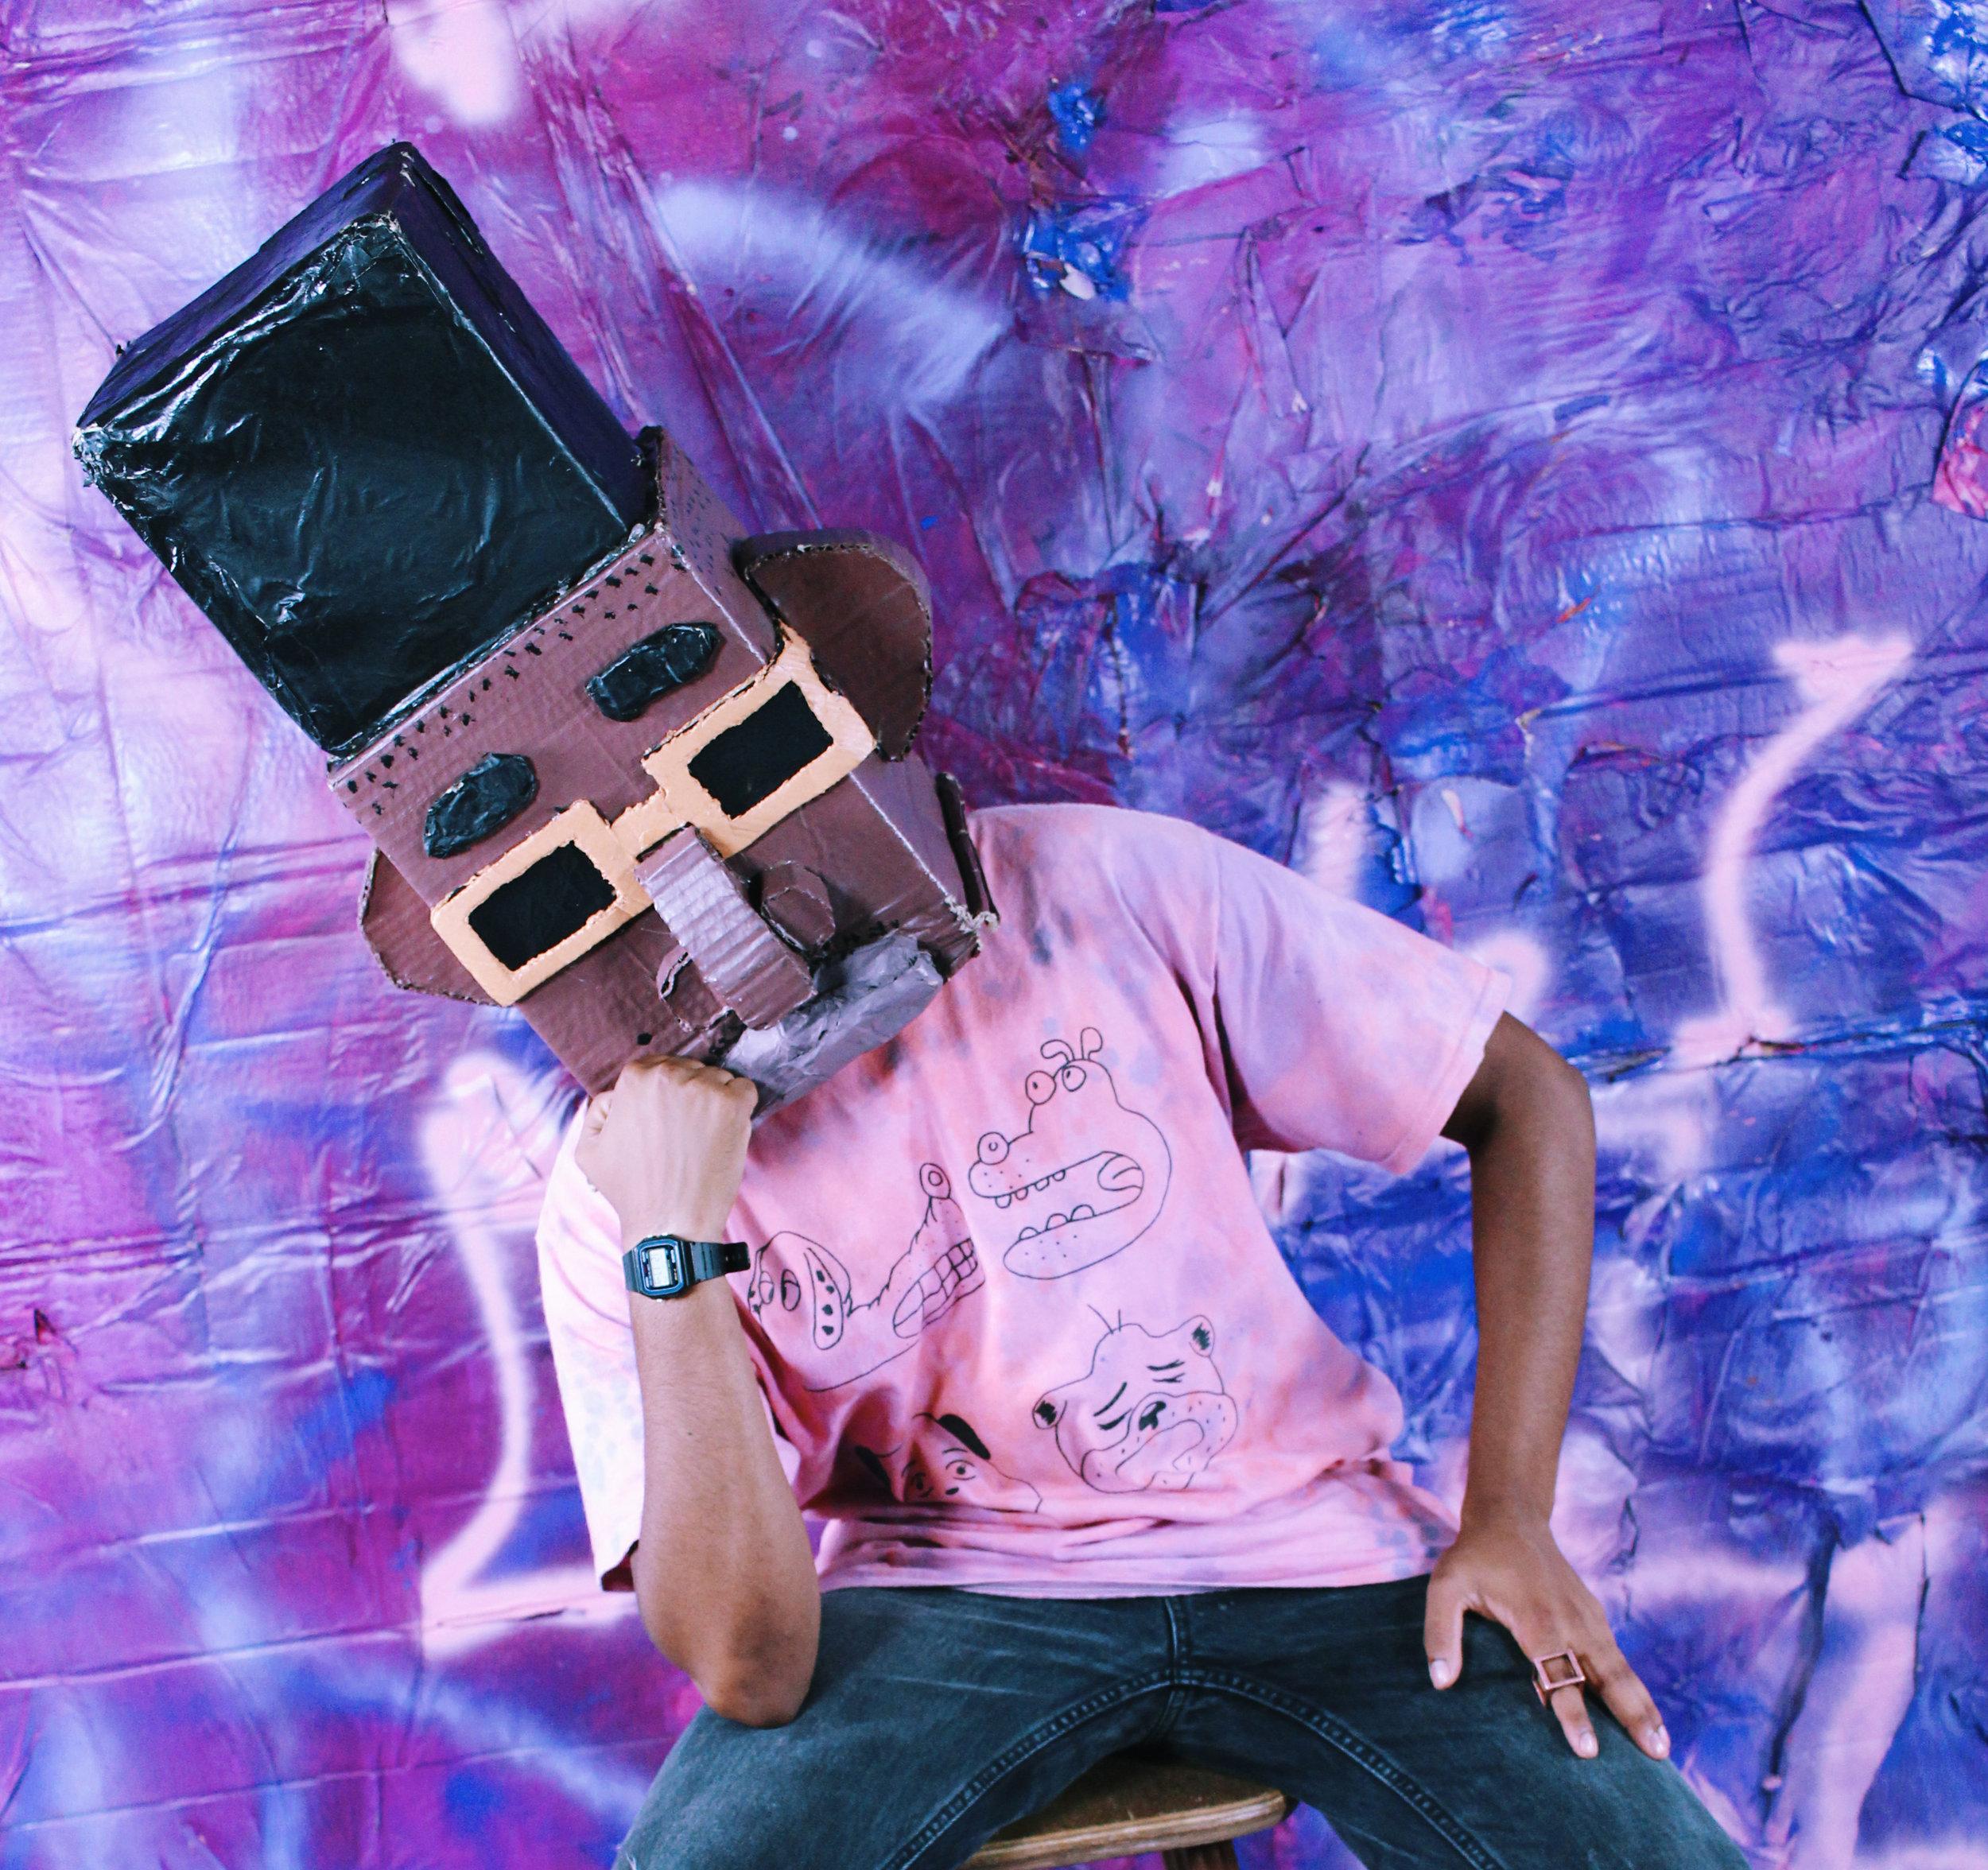 Dana Jones and His Thot Sculptures - Dana Jones is a sponsored artist and spokesperson for the Cool Kool Shirts shirt brand. Dana creates sculptures he calls